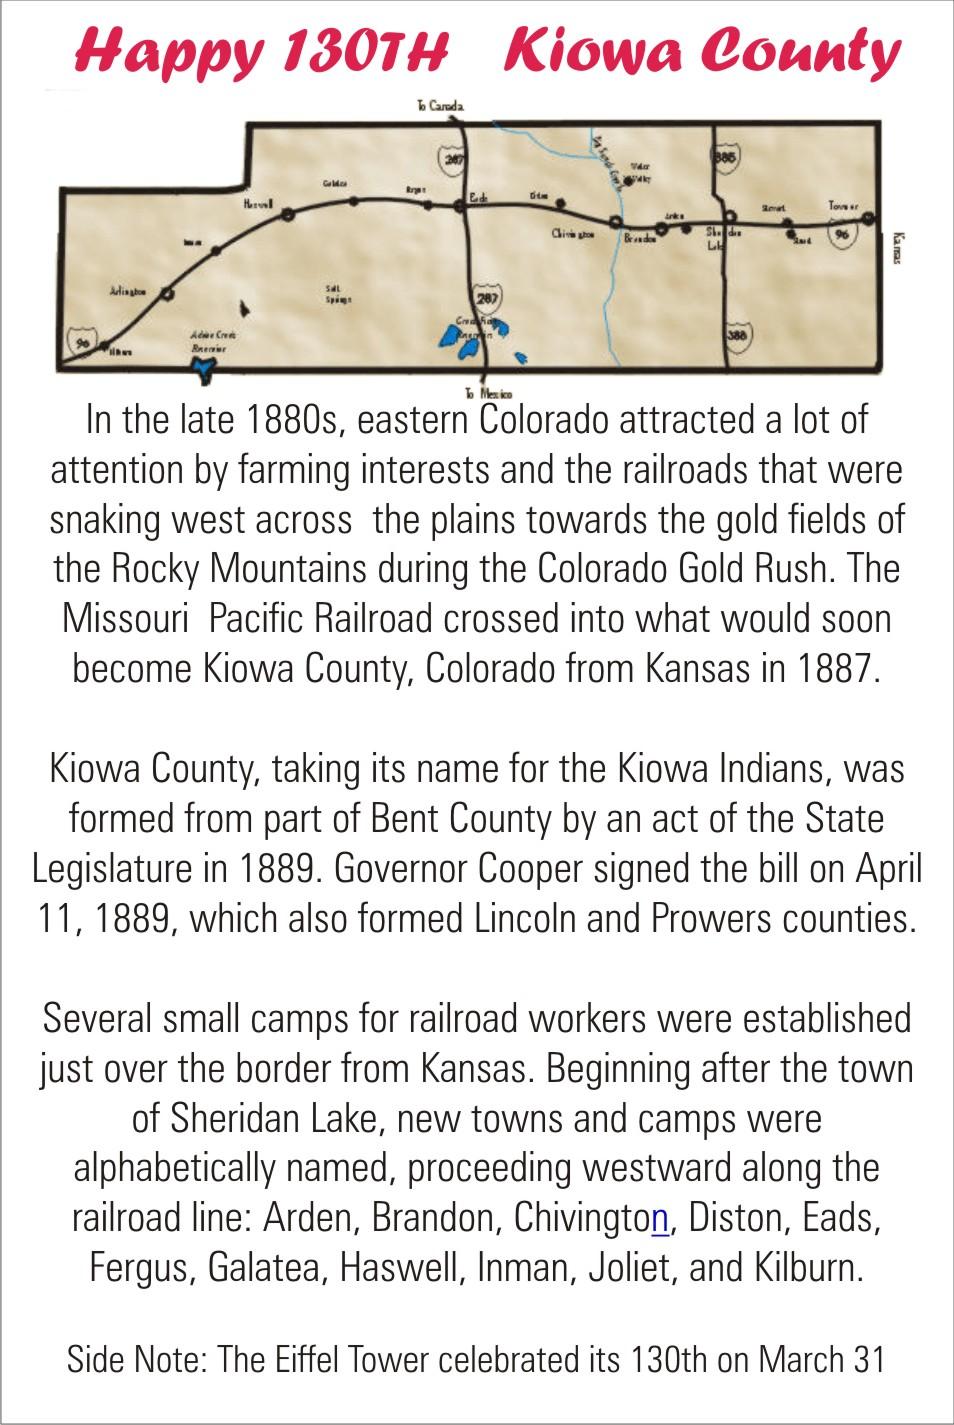 Happy Birthday to Kiowa County